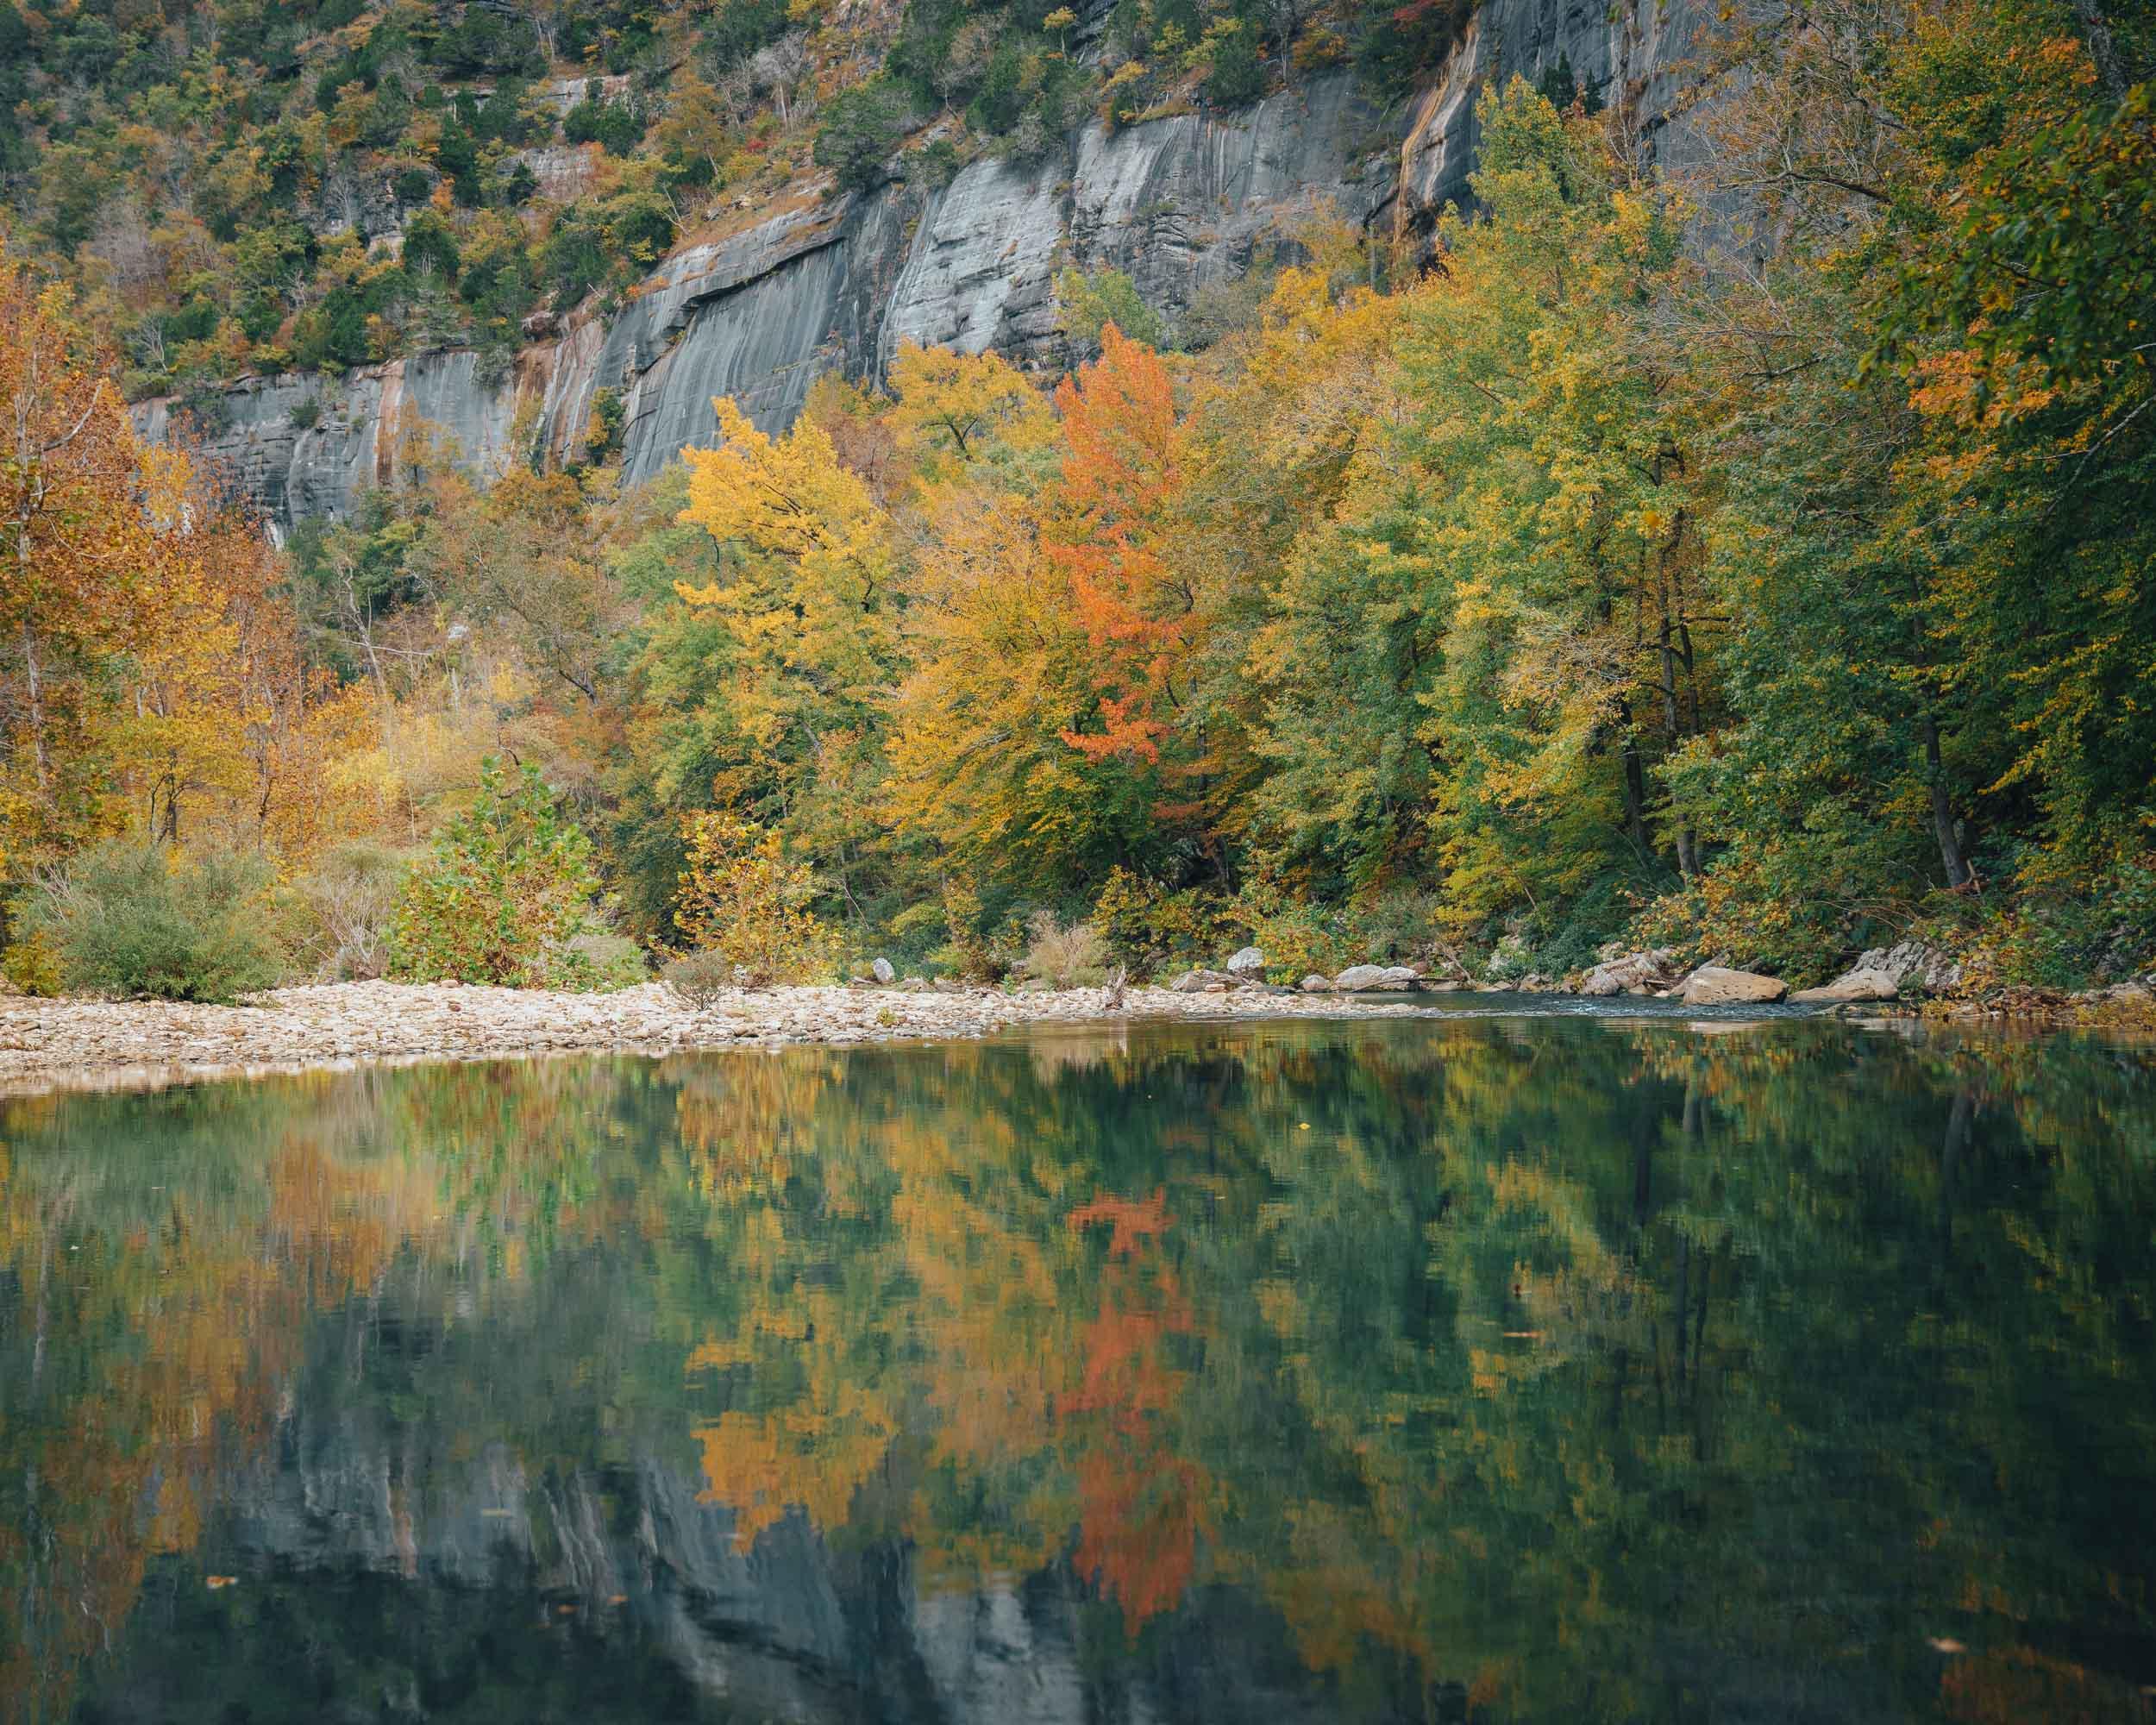 Autumn at Steel Creek